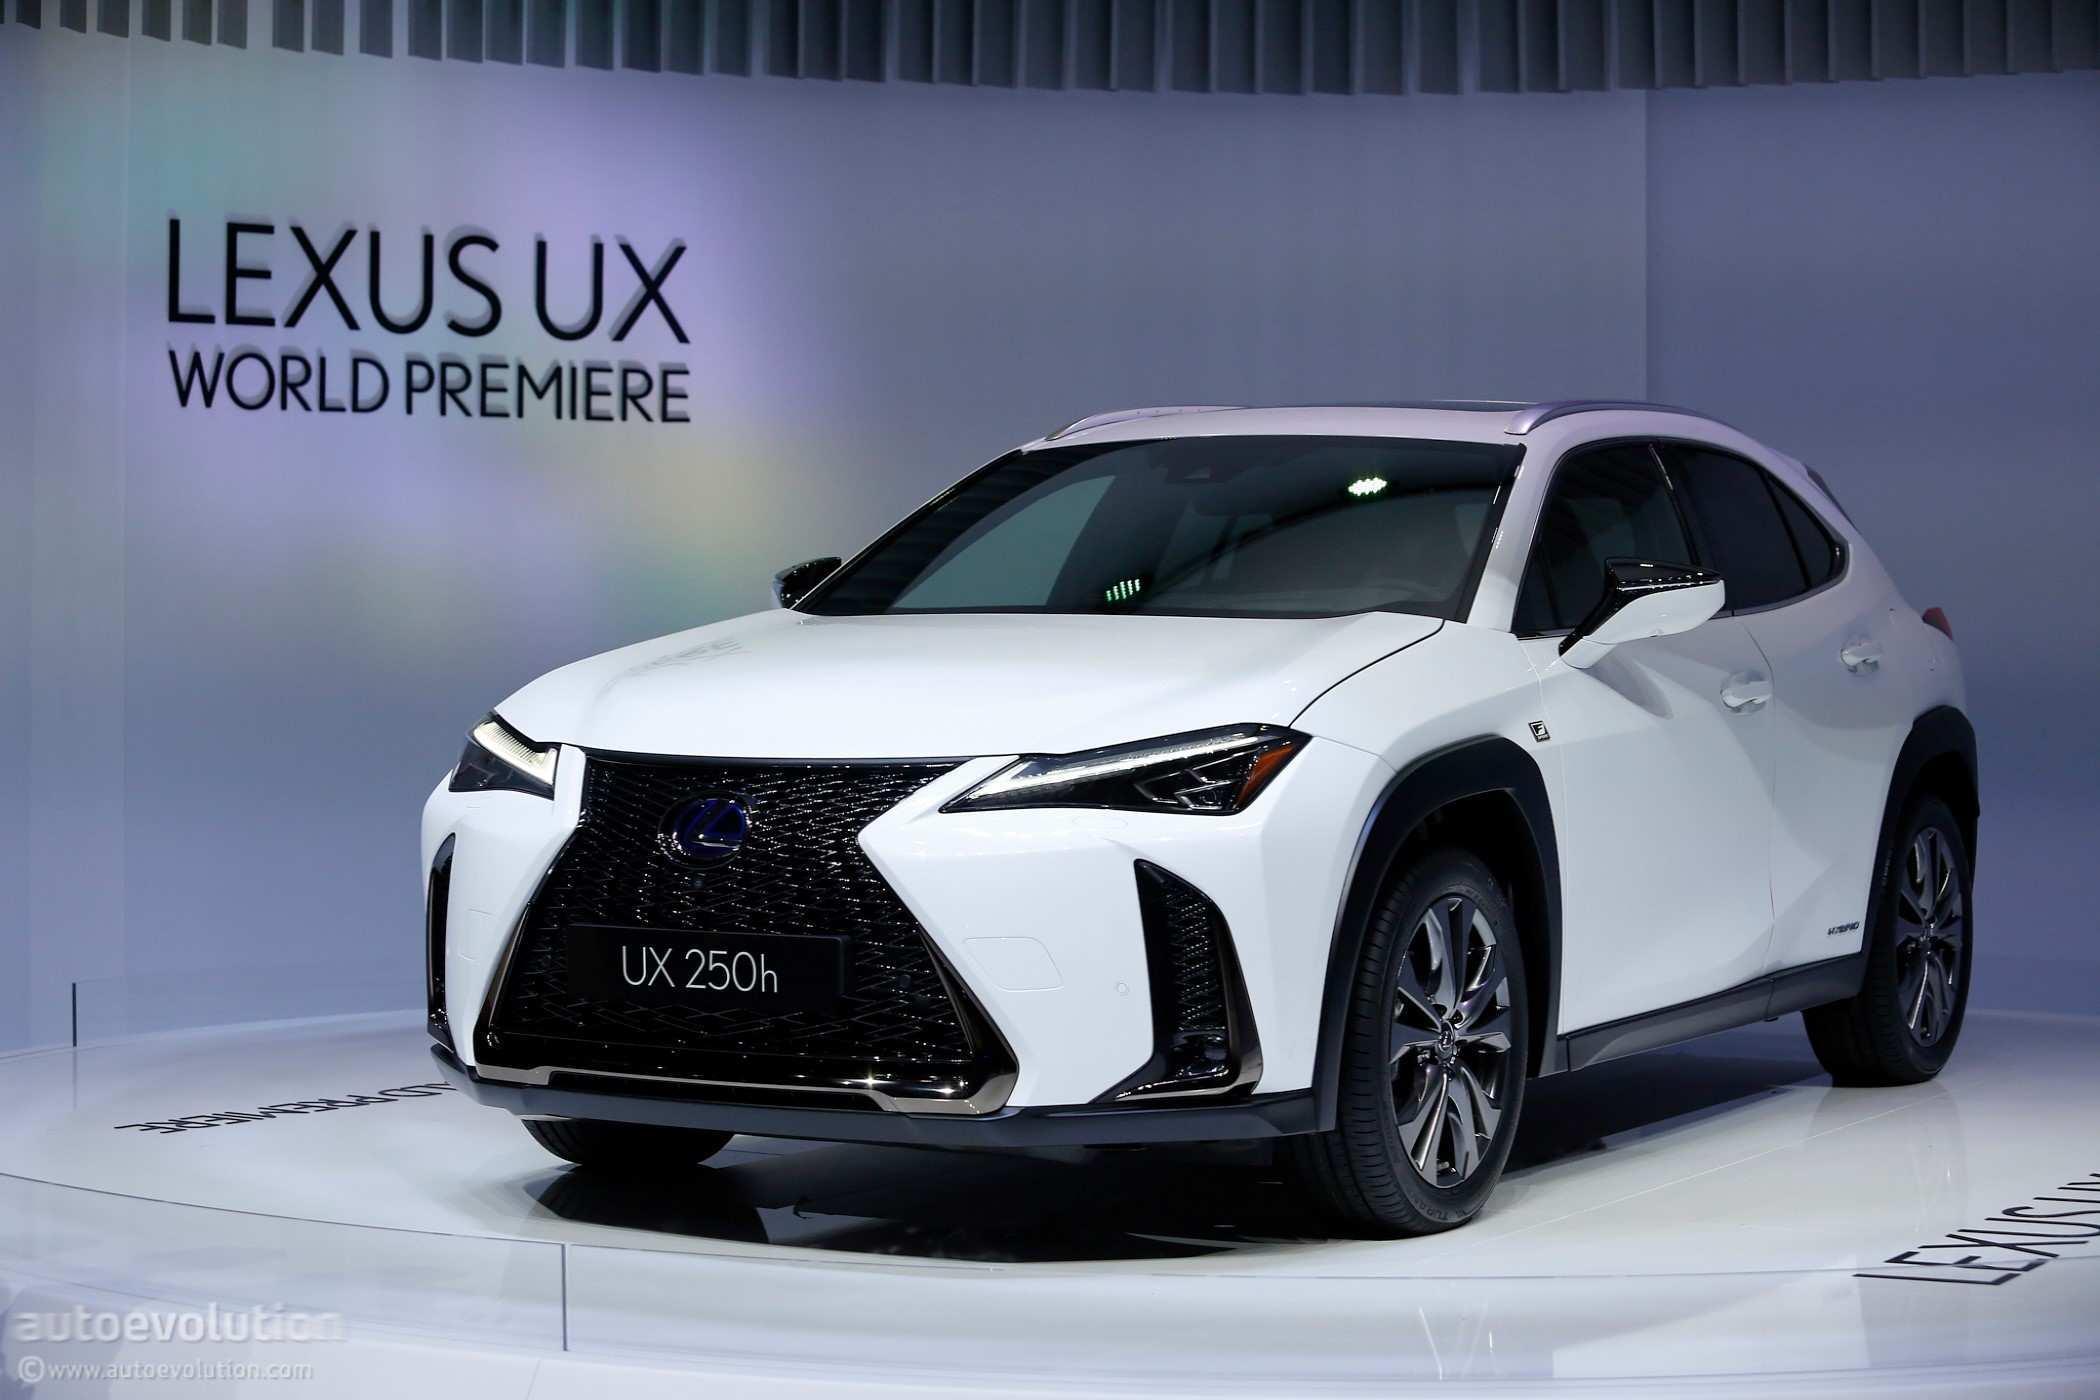 50 All New 2020 Lexus Ux Hybrid Pricing with 2020 Lexus Ux Hybrid